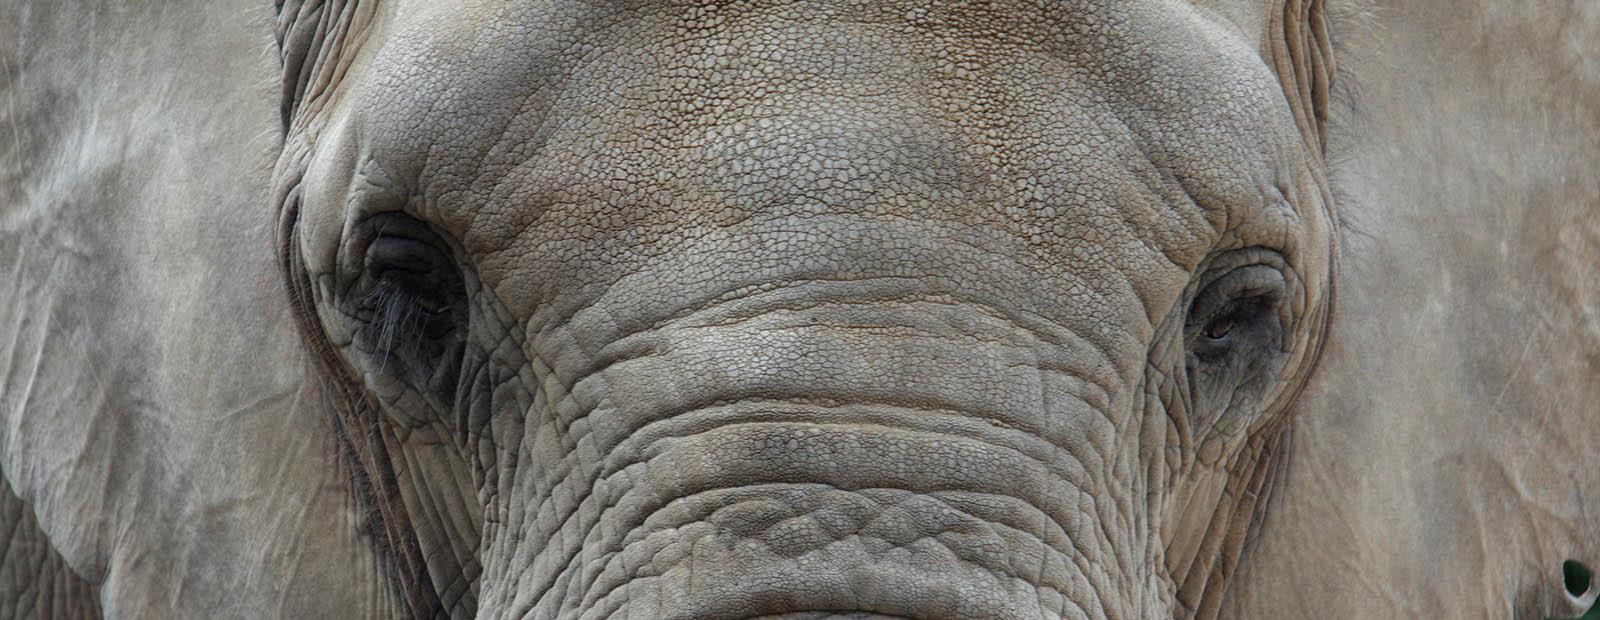 Elefant Mwana